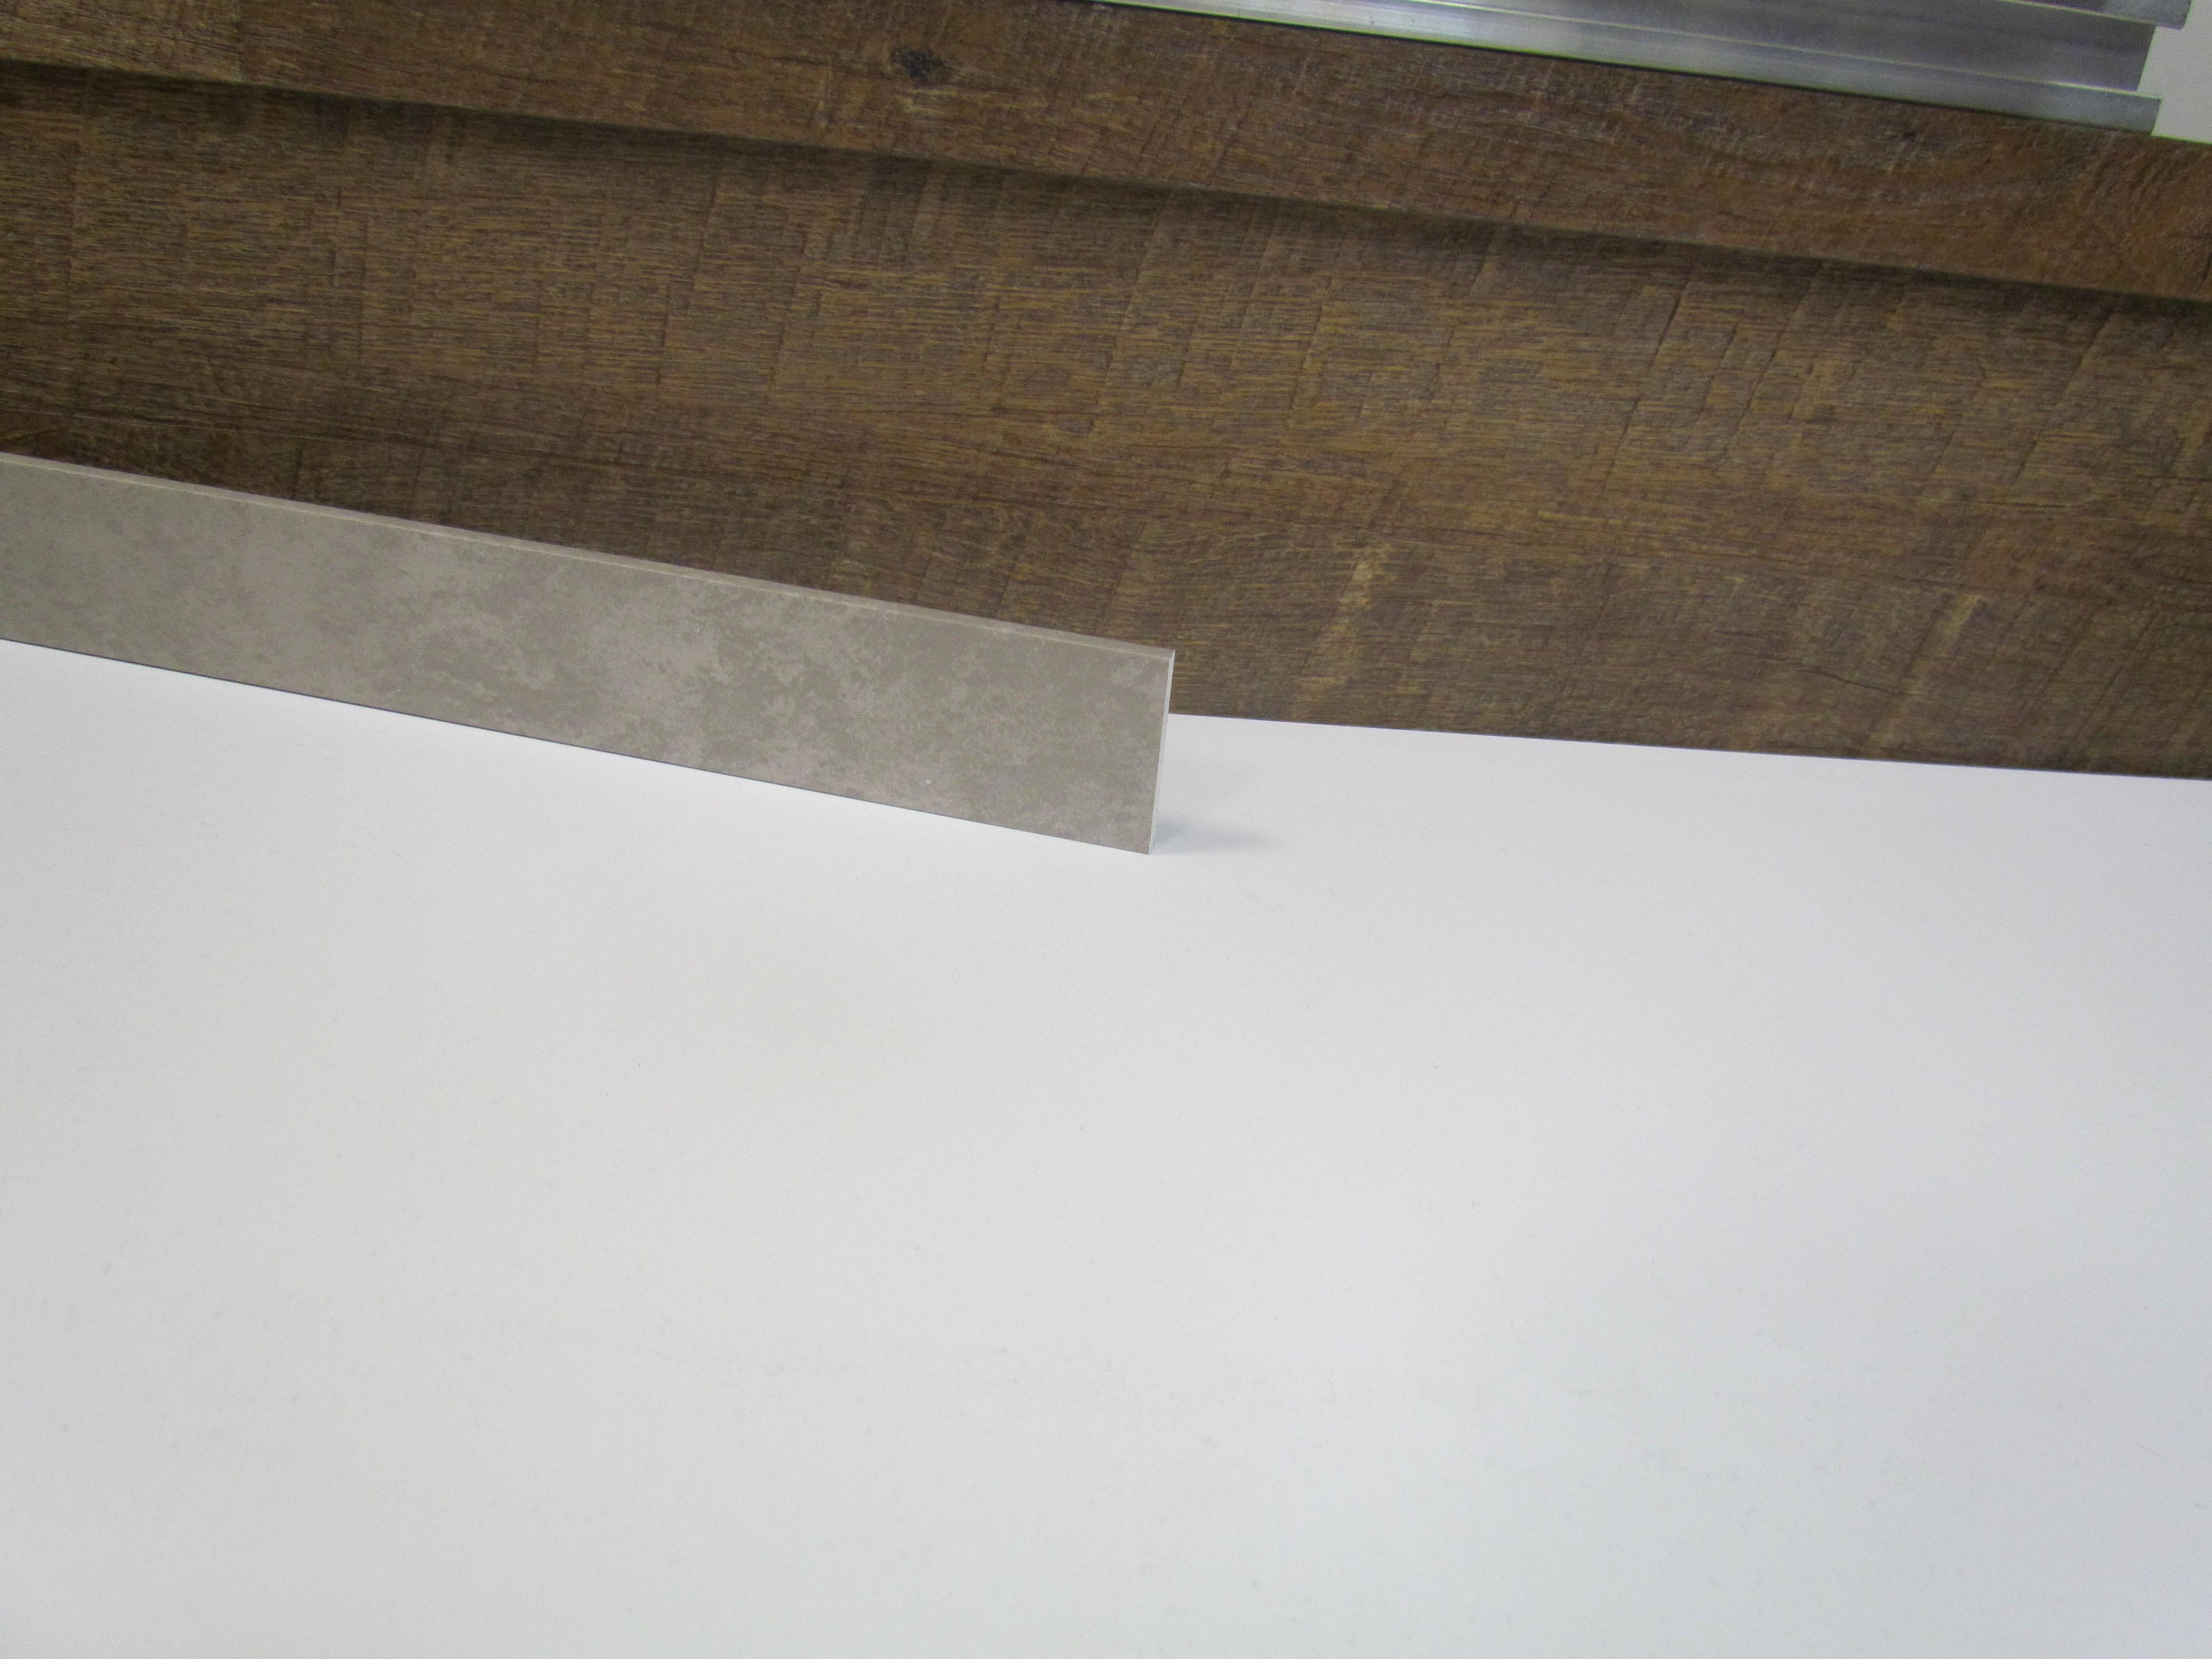 vinyl steinoptik trendy steinoptik vinyl fliesen rubens. Black Bedroom Furniture Sets. Home Design Ideas